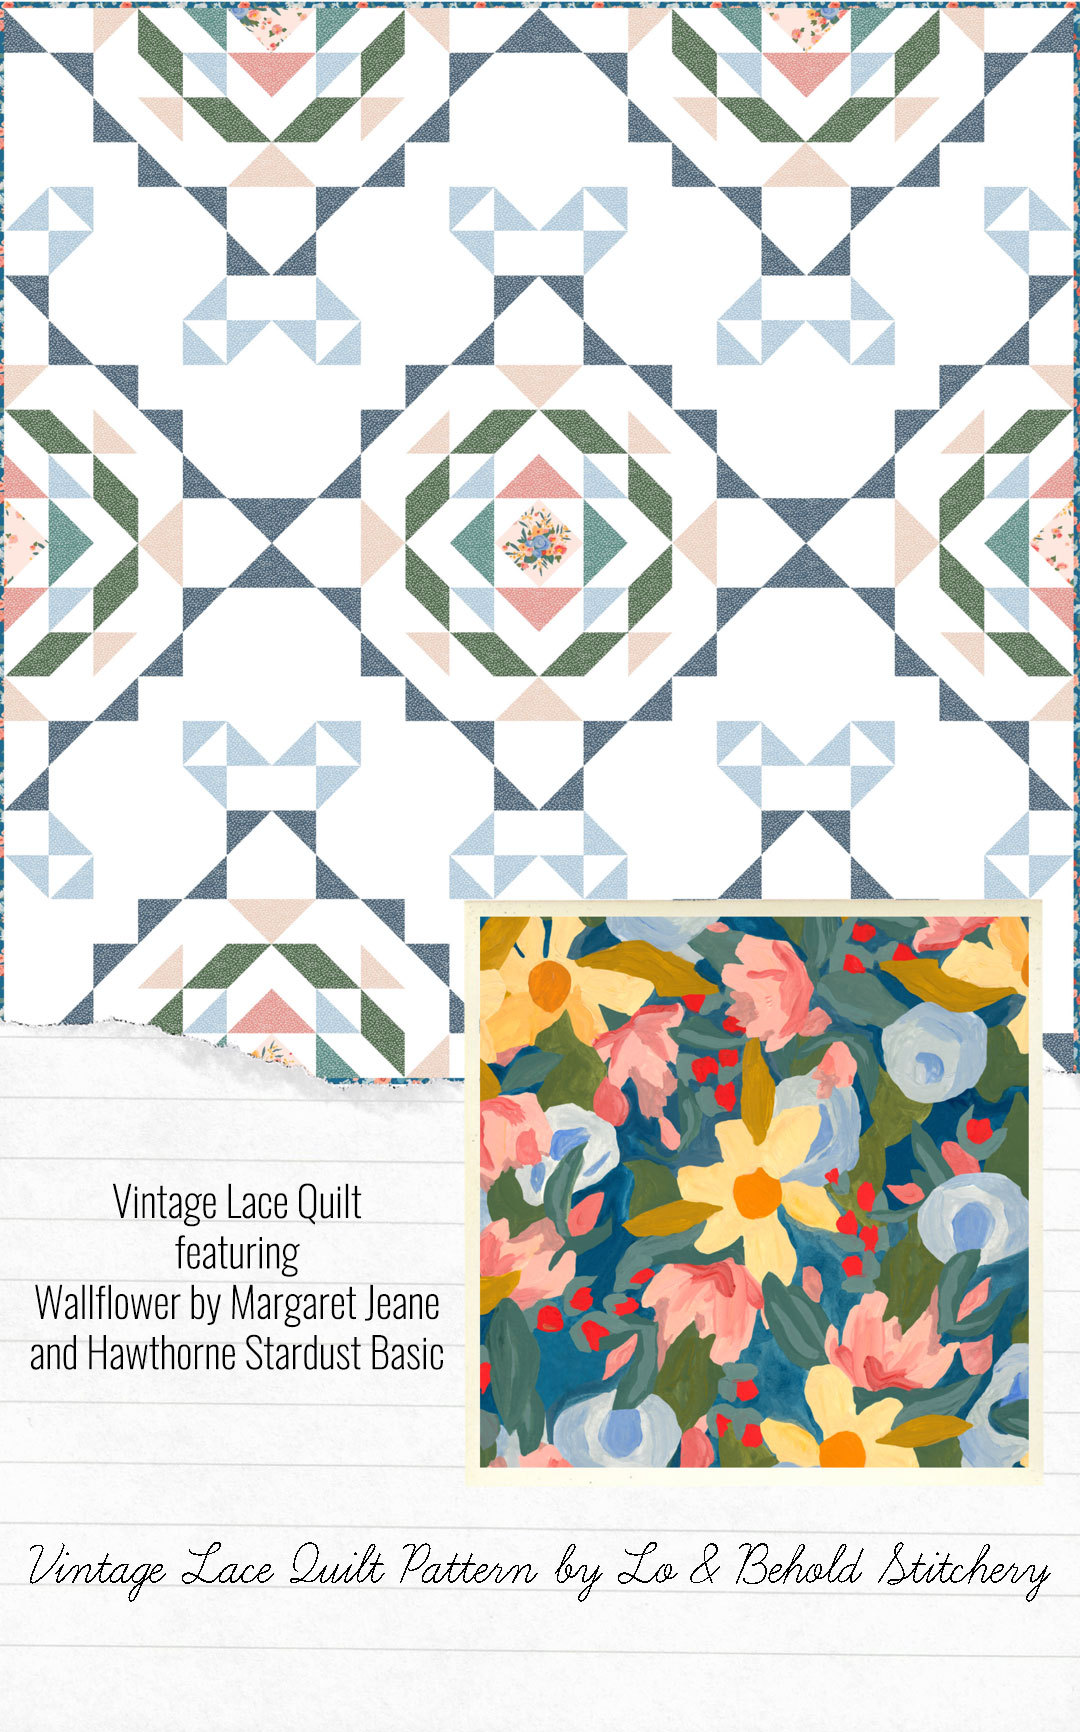 Wallflower-Vintage-Lace-Quilt